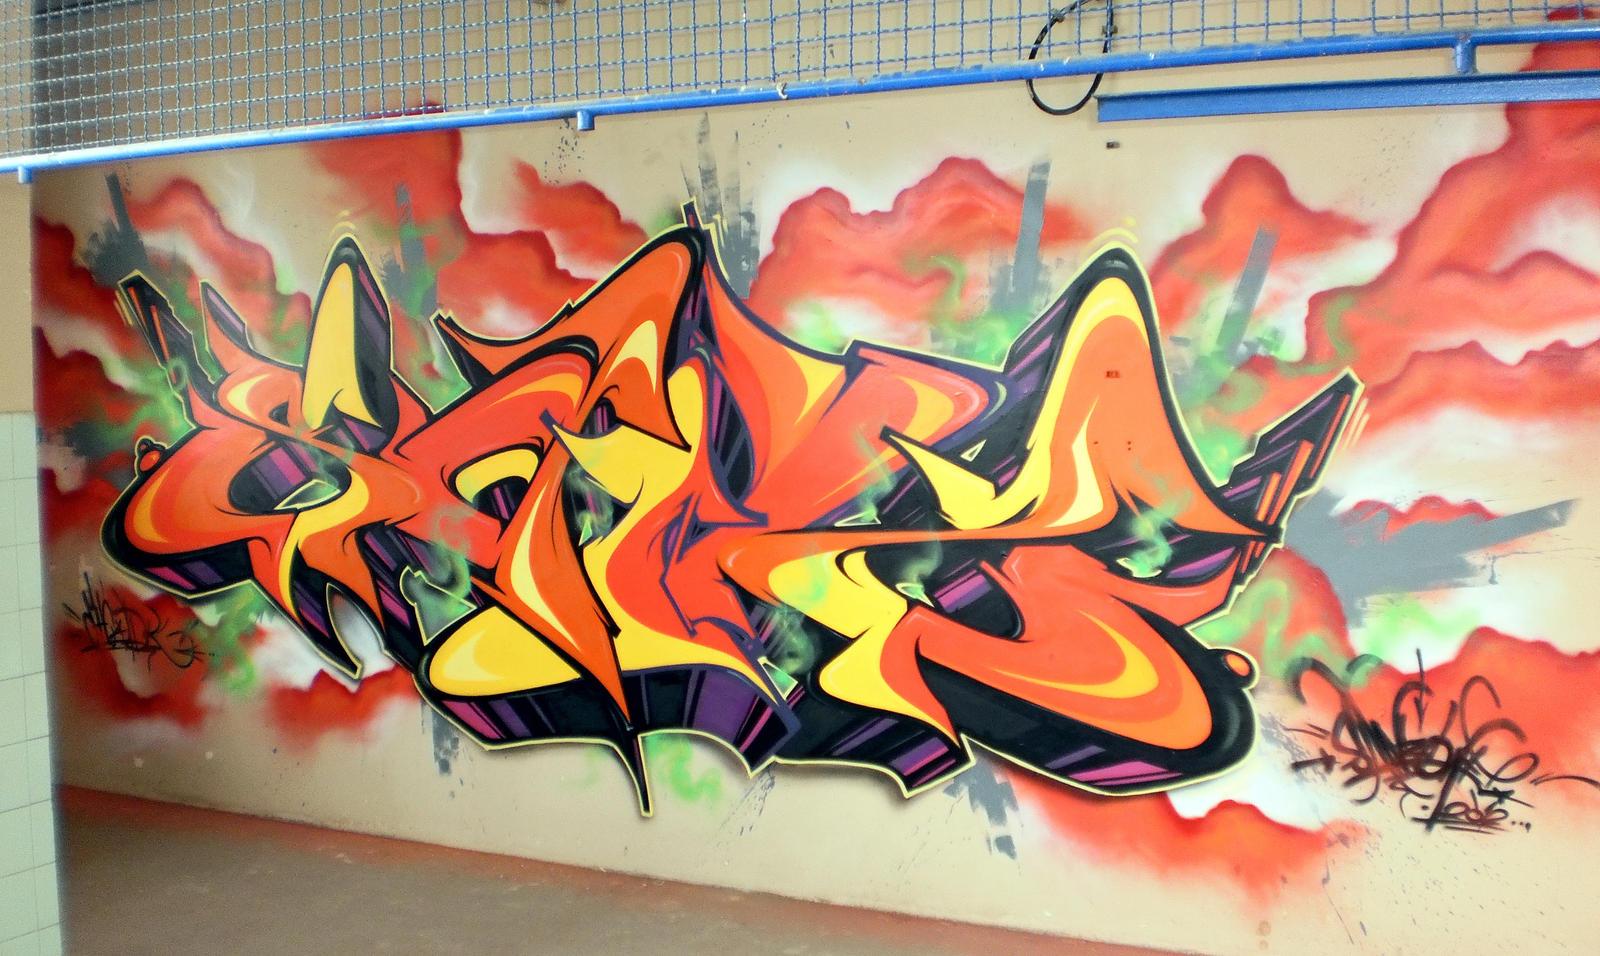 BURN EM UPP!! by SANS-01-2-MHC-BS